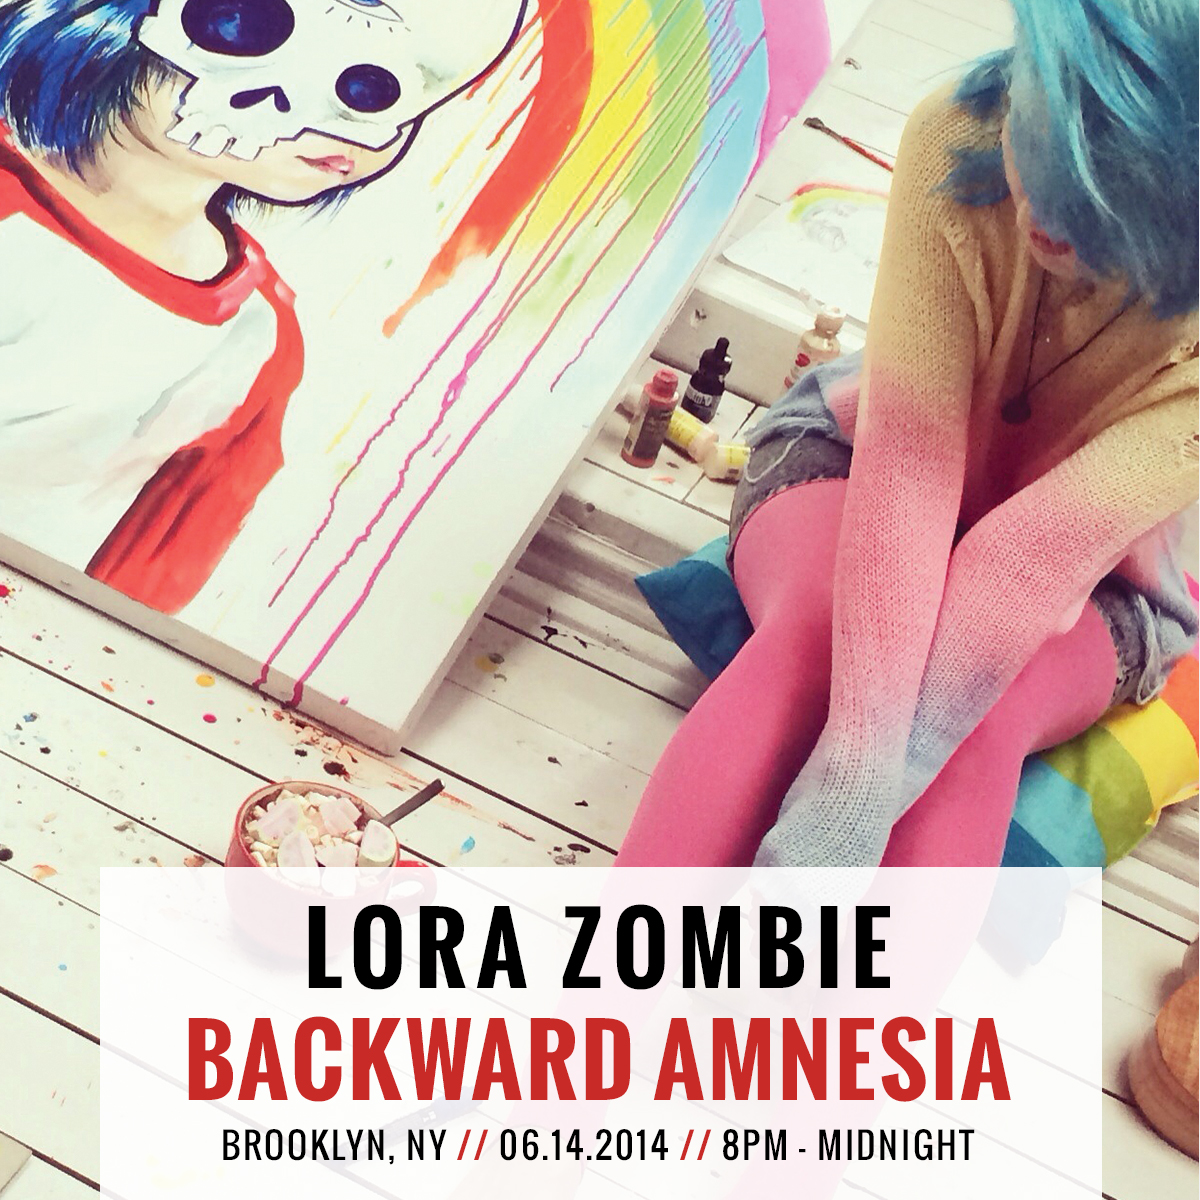 lora zombie backward amnesia flyer